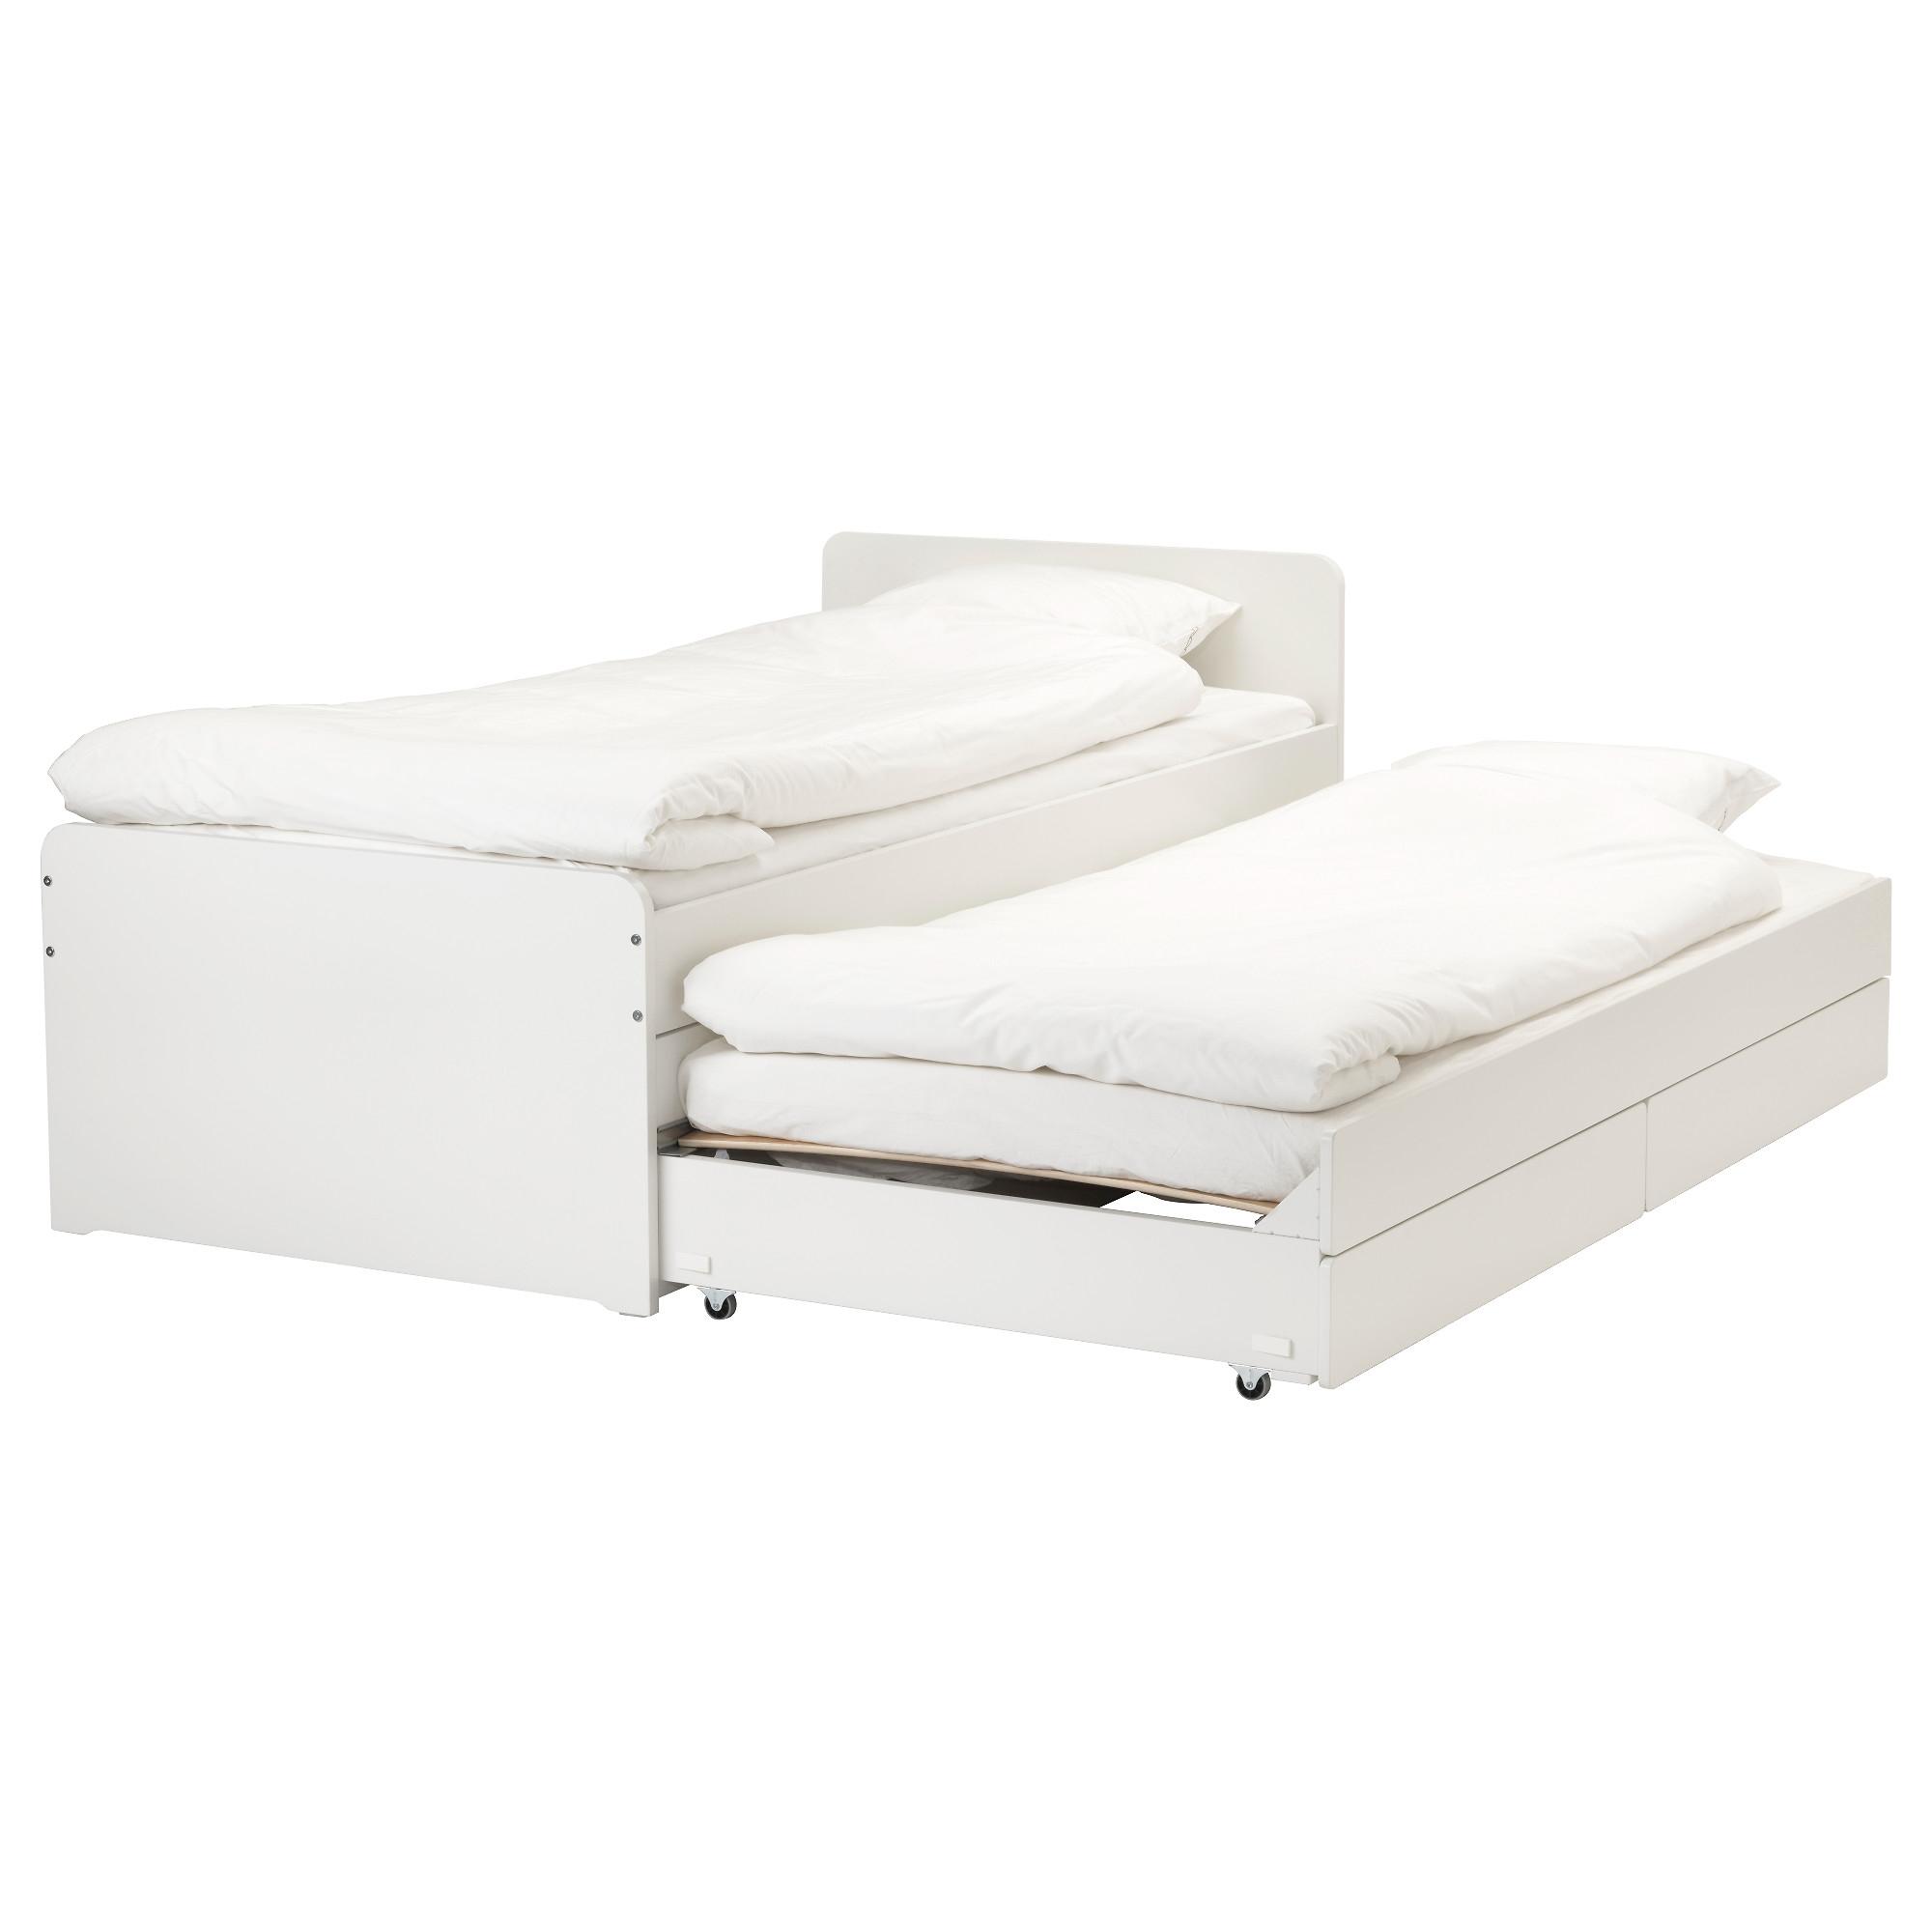 Cama nido con cama inferior Mini Home - Twins